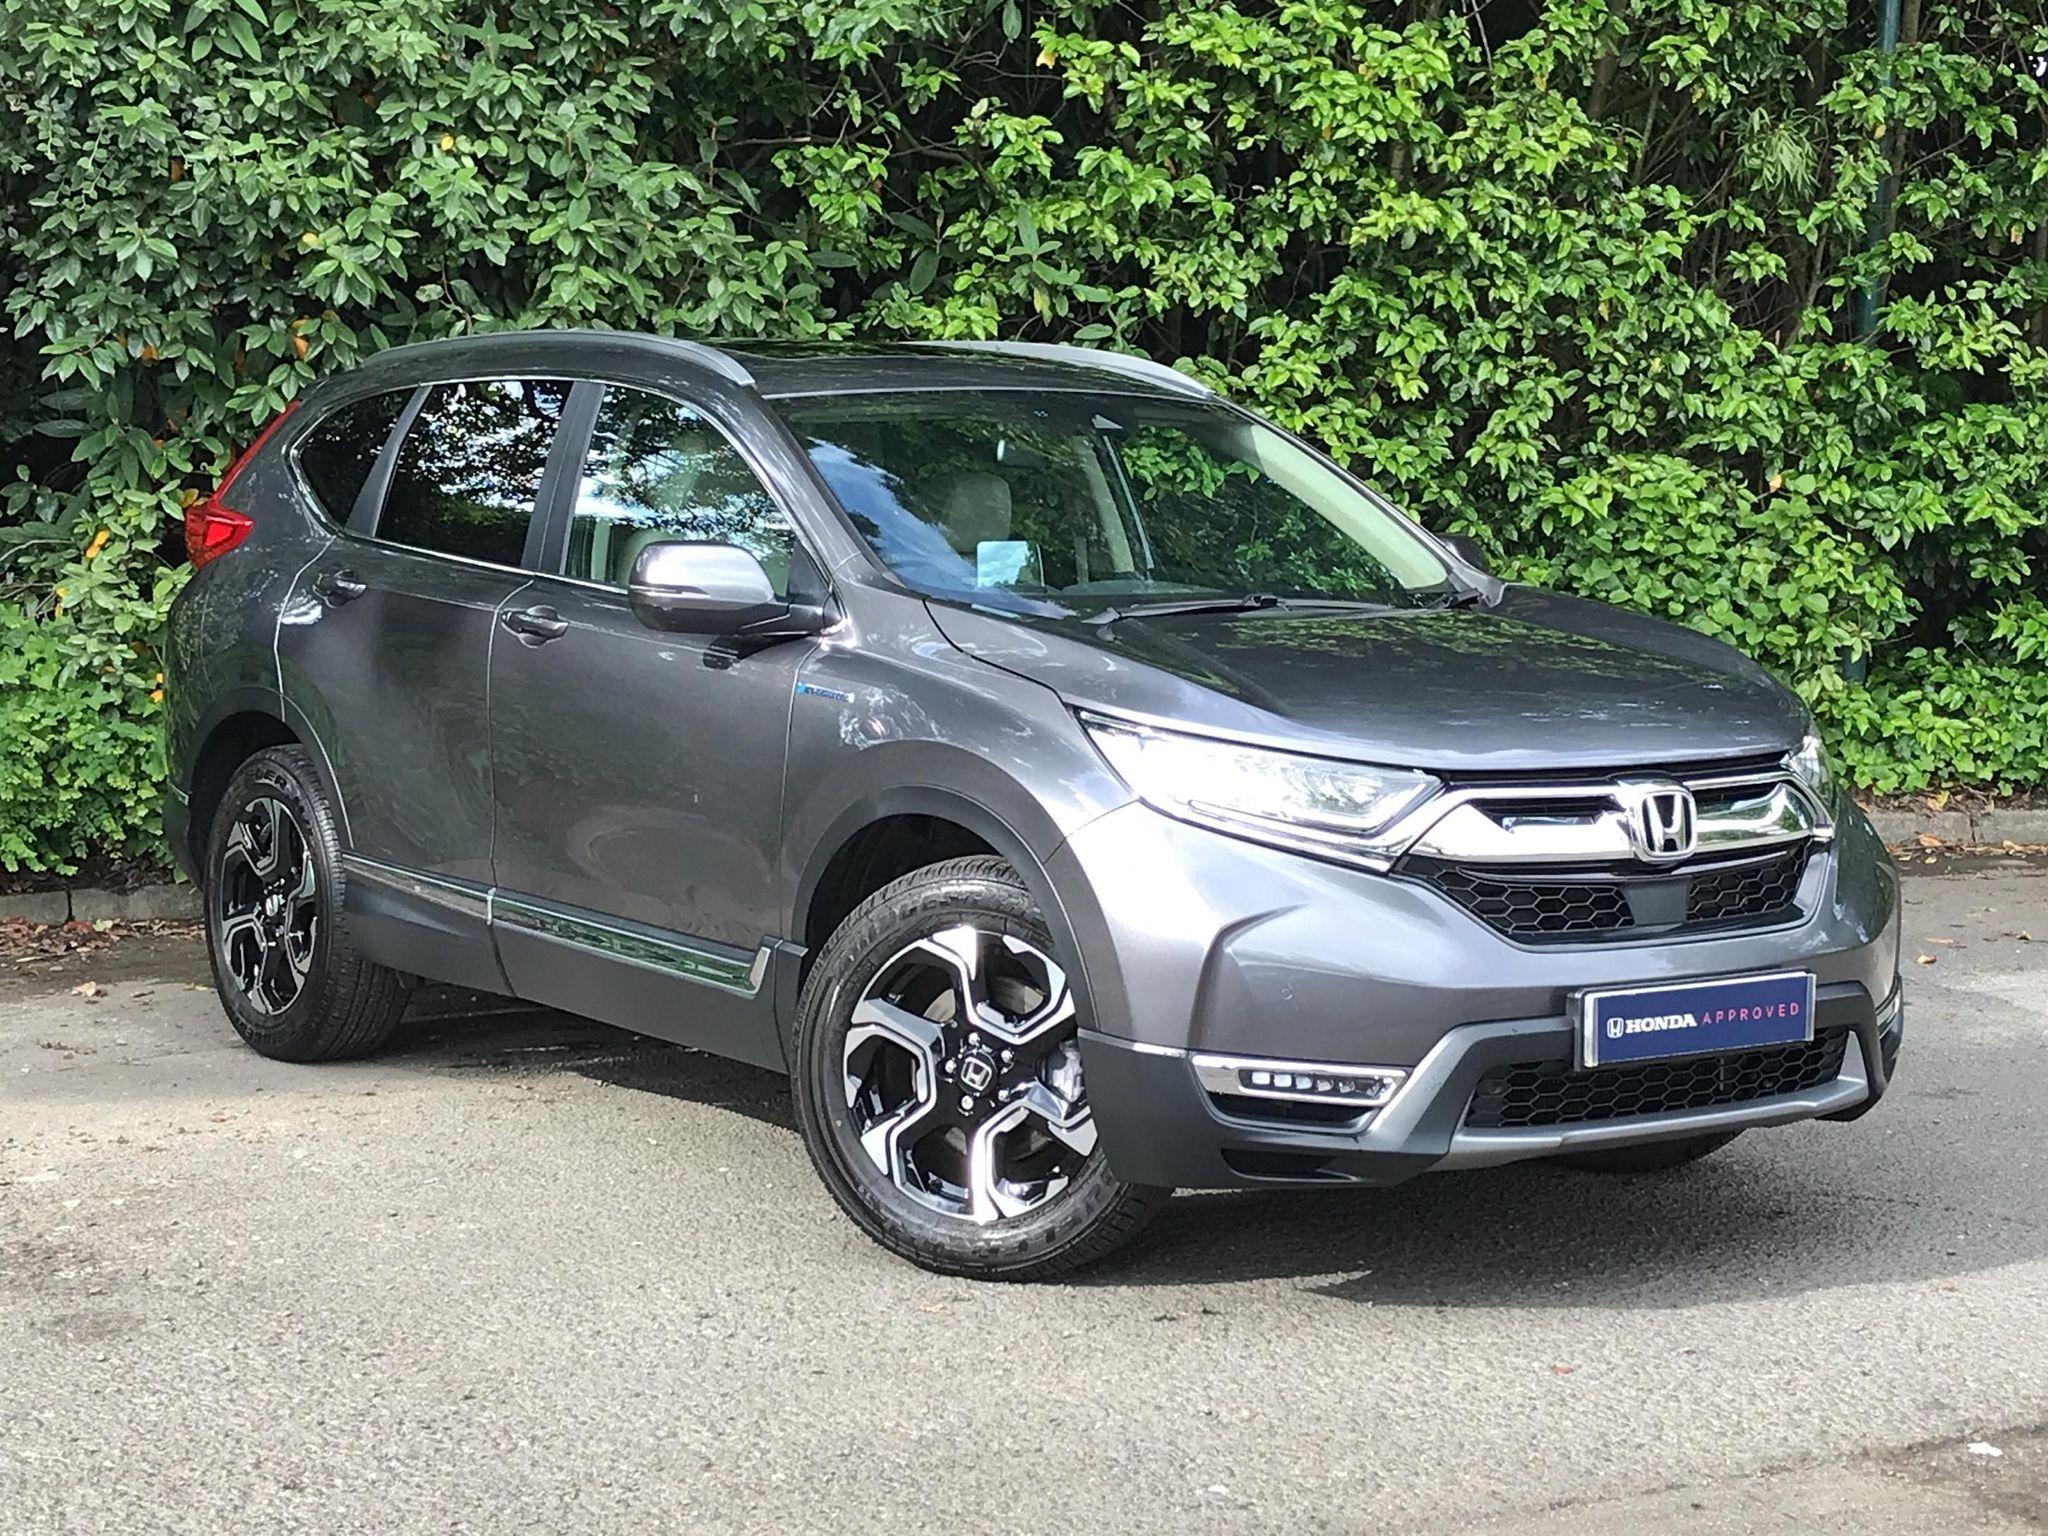 Honda CR-V 2.0 h i-MMD EX eCVT 4WD (s/s) 5dr